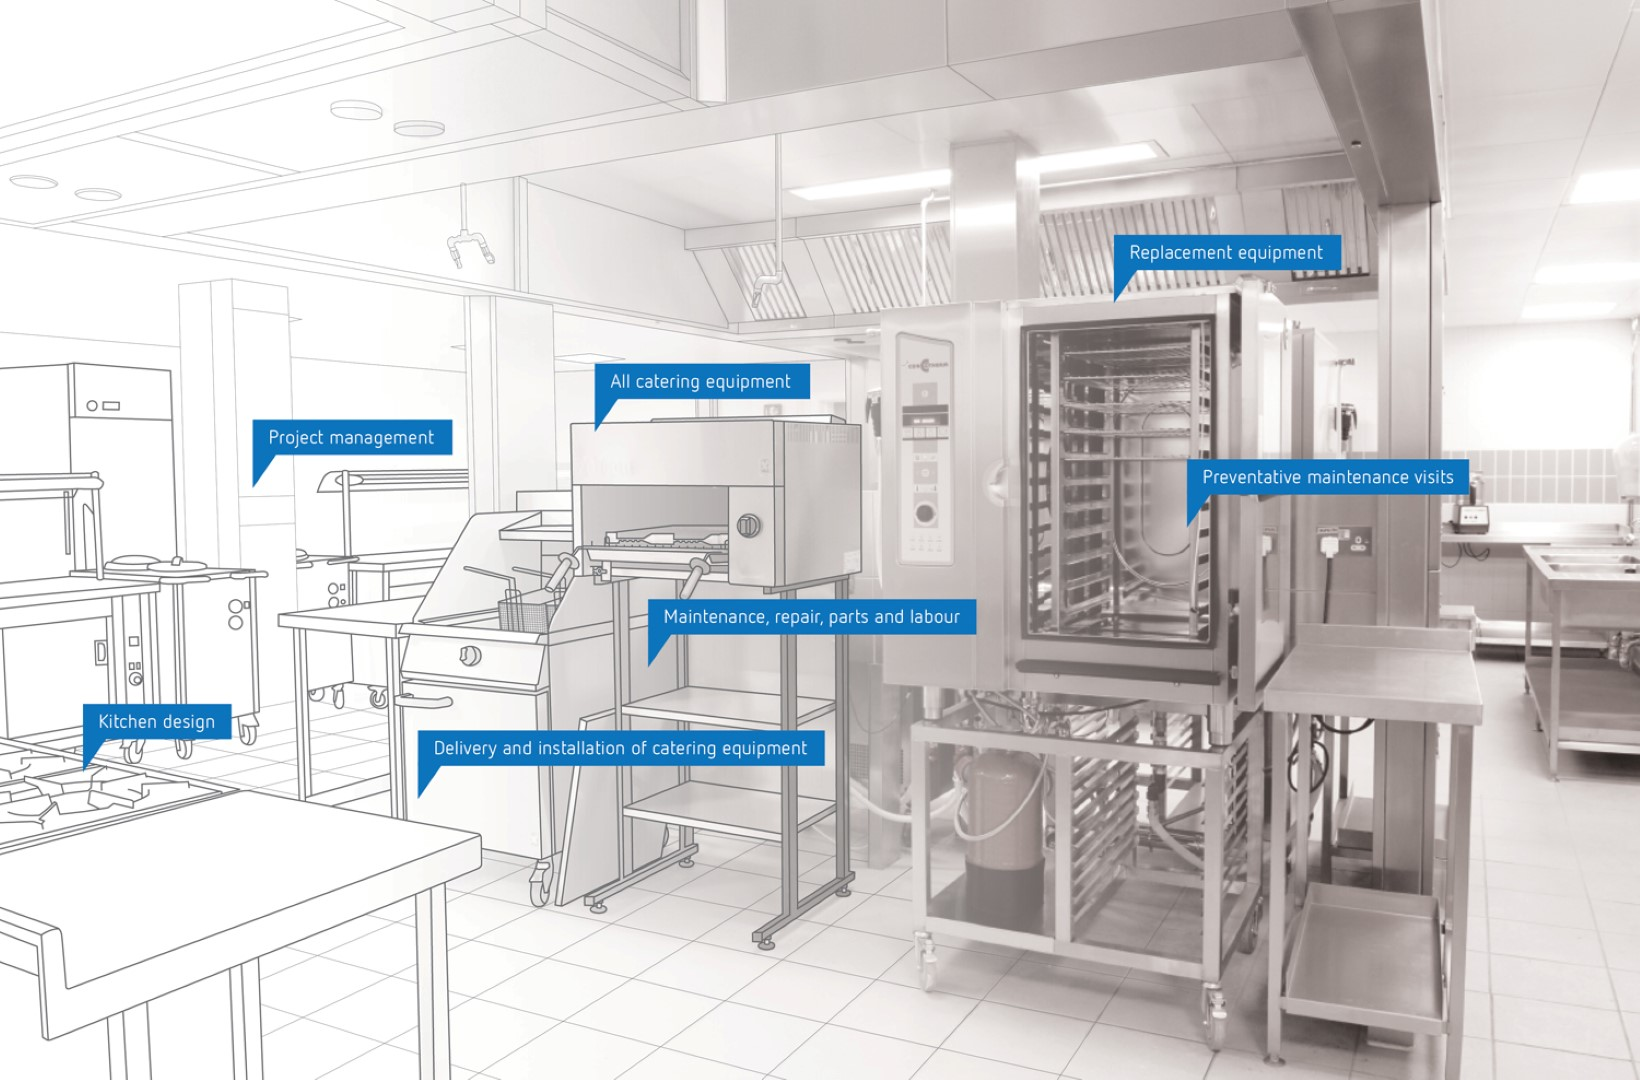 KitchenFM - Catering Equipment, Kitchen Management, and Maintenance